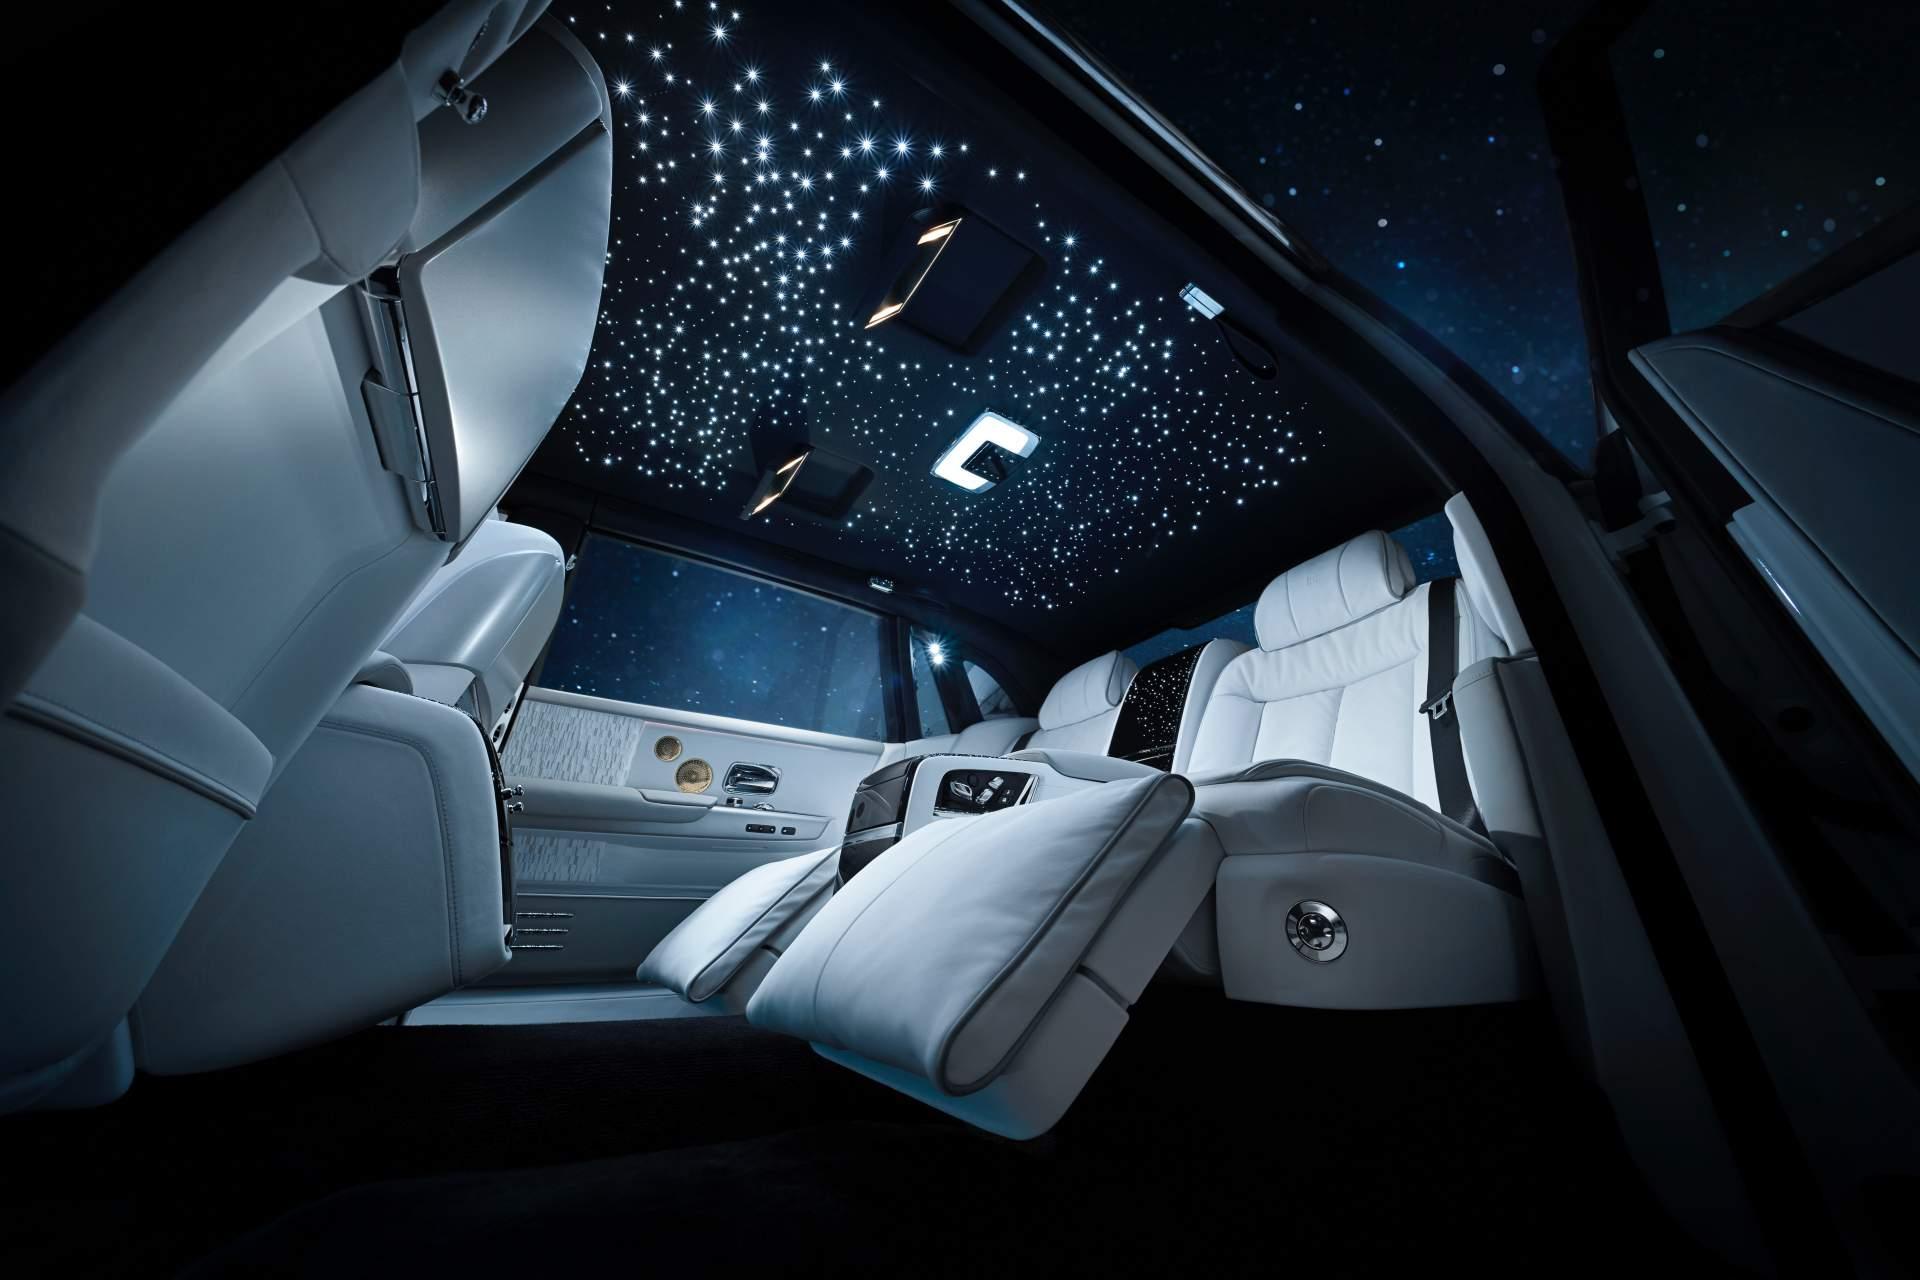 Rolls Royce Interior Wallpapers Wallpaper Cave